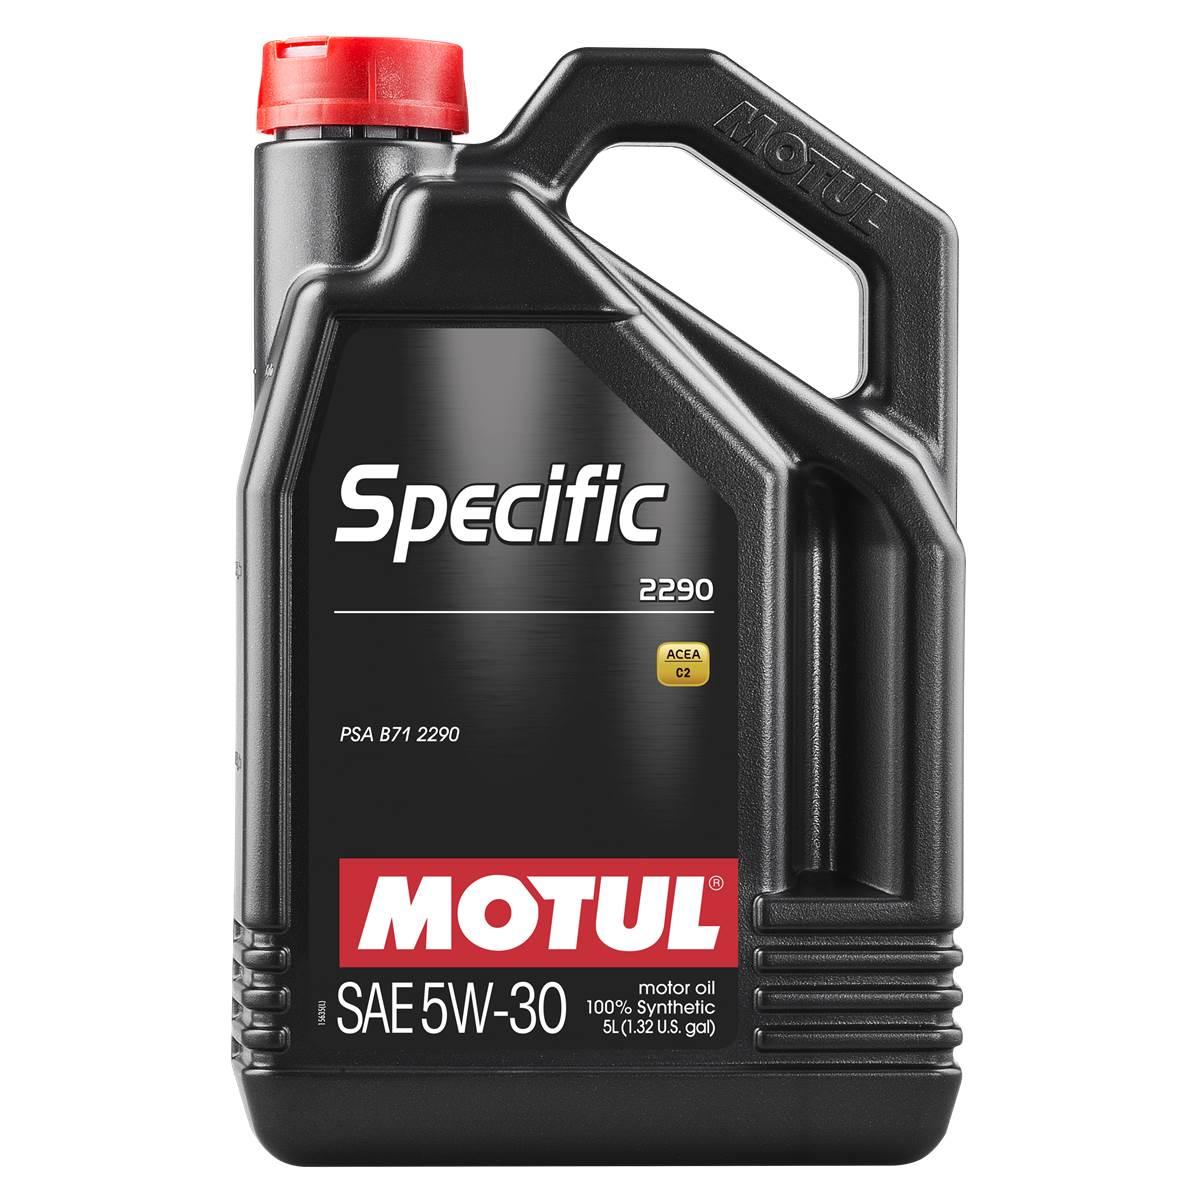 Huile moteur Motul specific 2290 C2 essence et diesel 5W30 5L